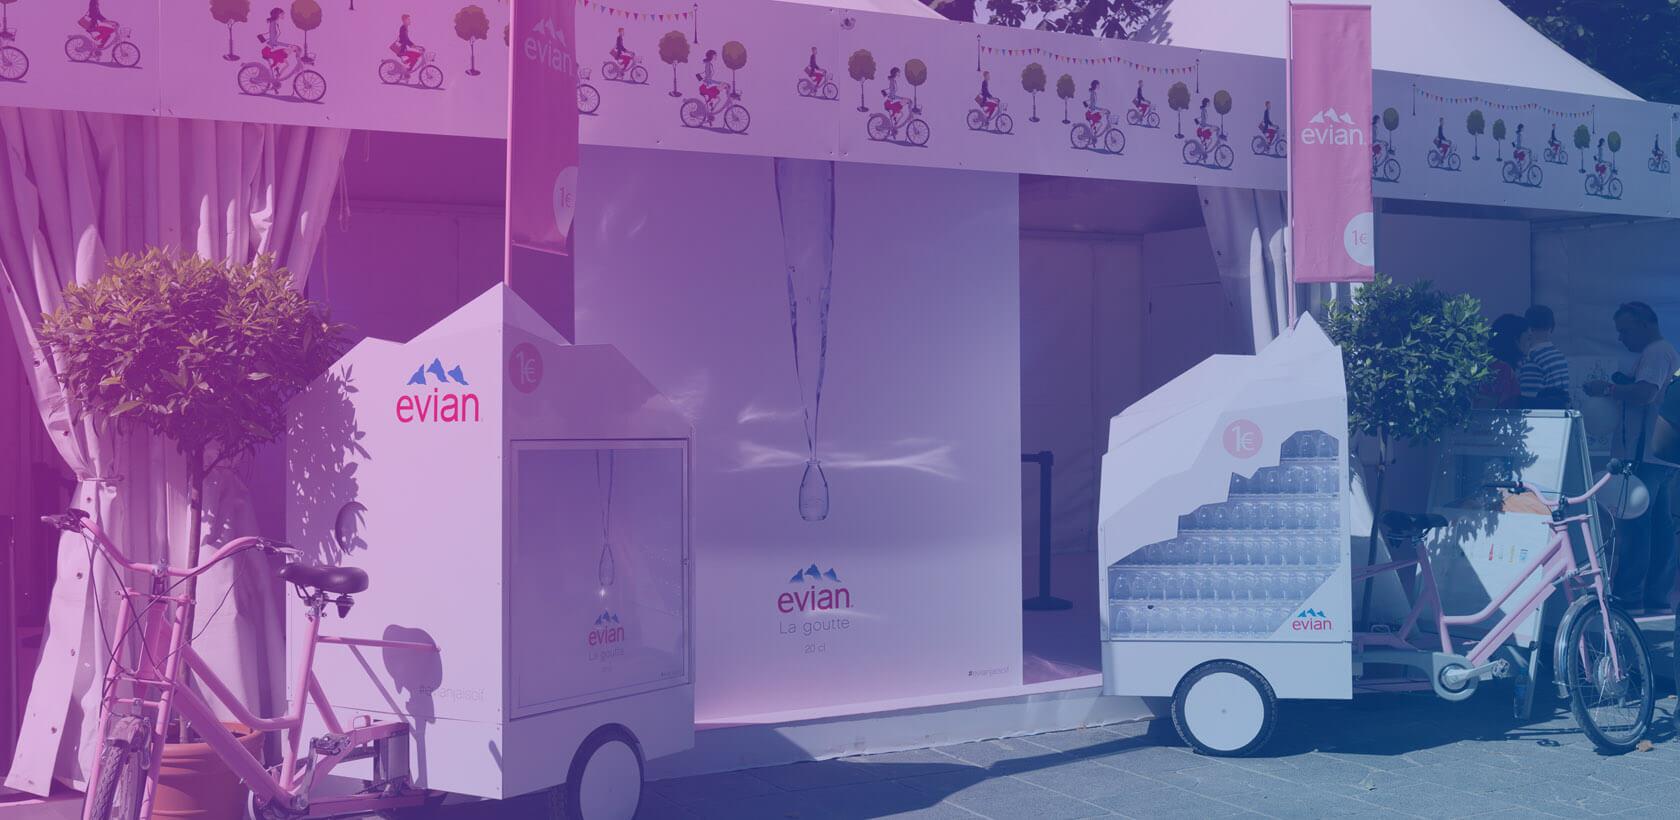 Evian Street Marketing - Globe Events Marketing